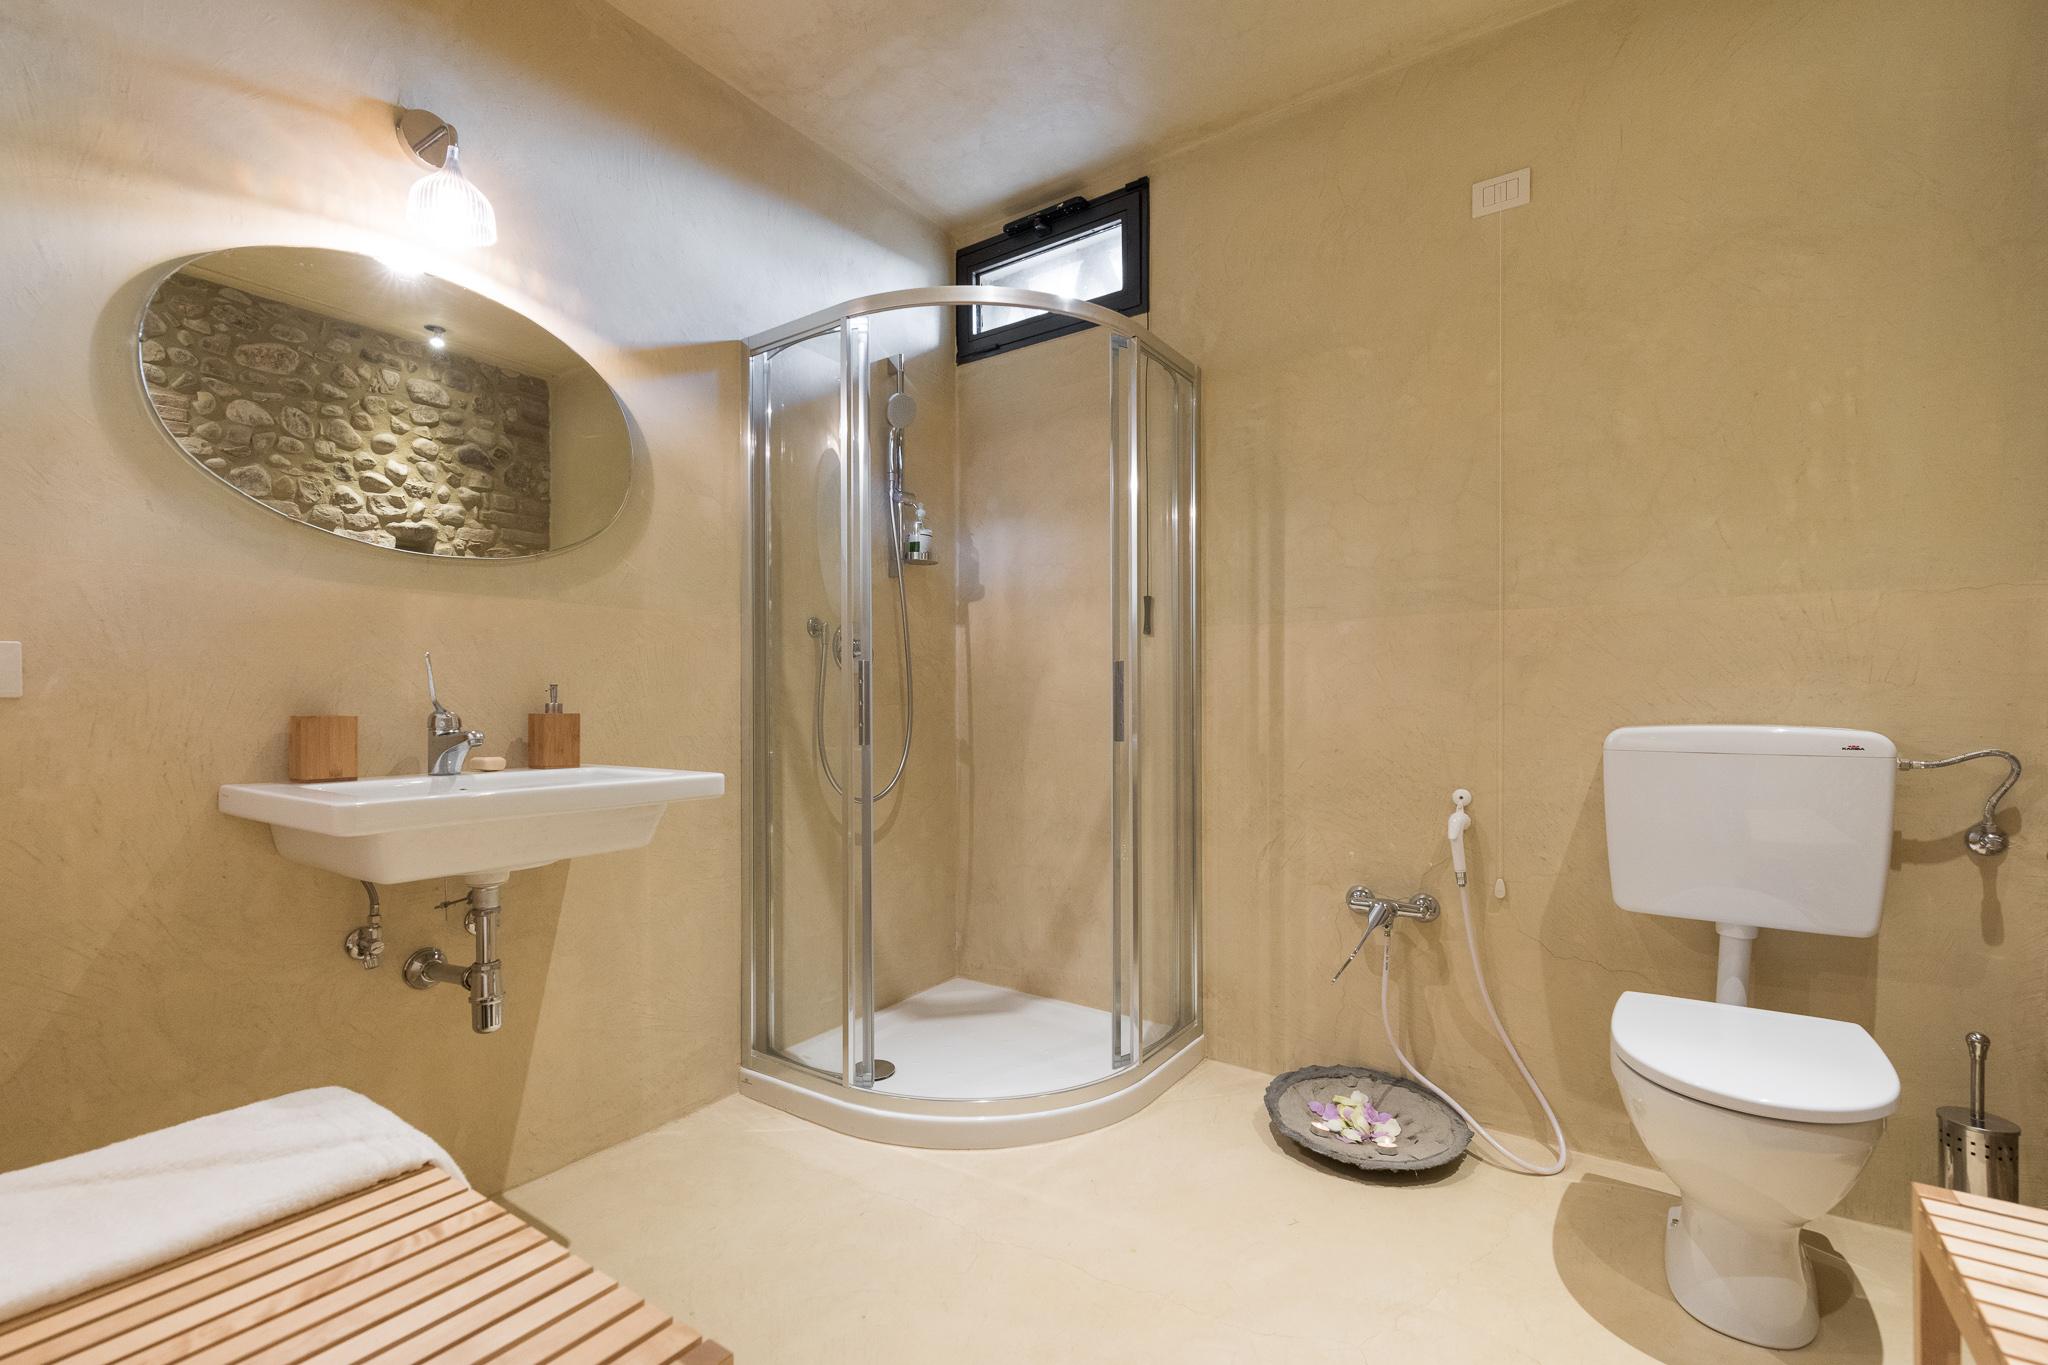 Fienile Bathroom